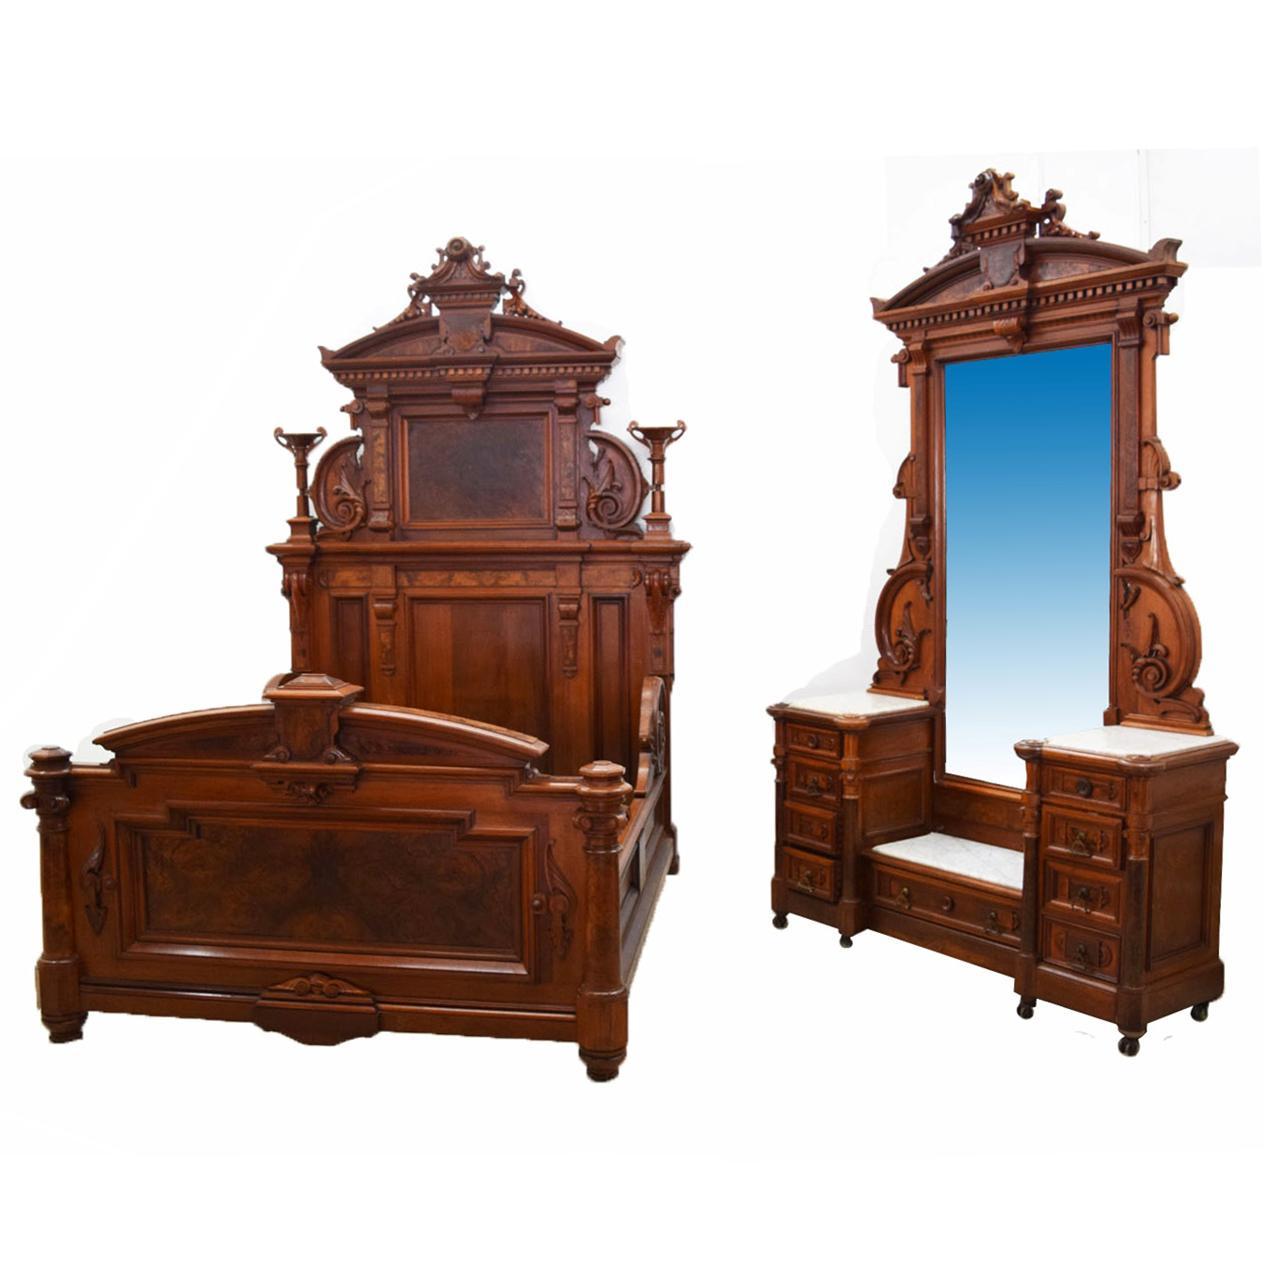 Renaissance Bedroom Furniture Renaissance Revival Bedroom Suite Walnut And Burl C 1870 By